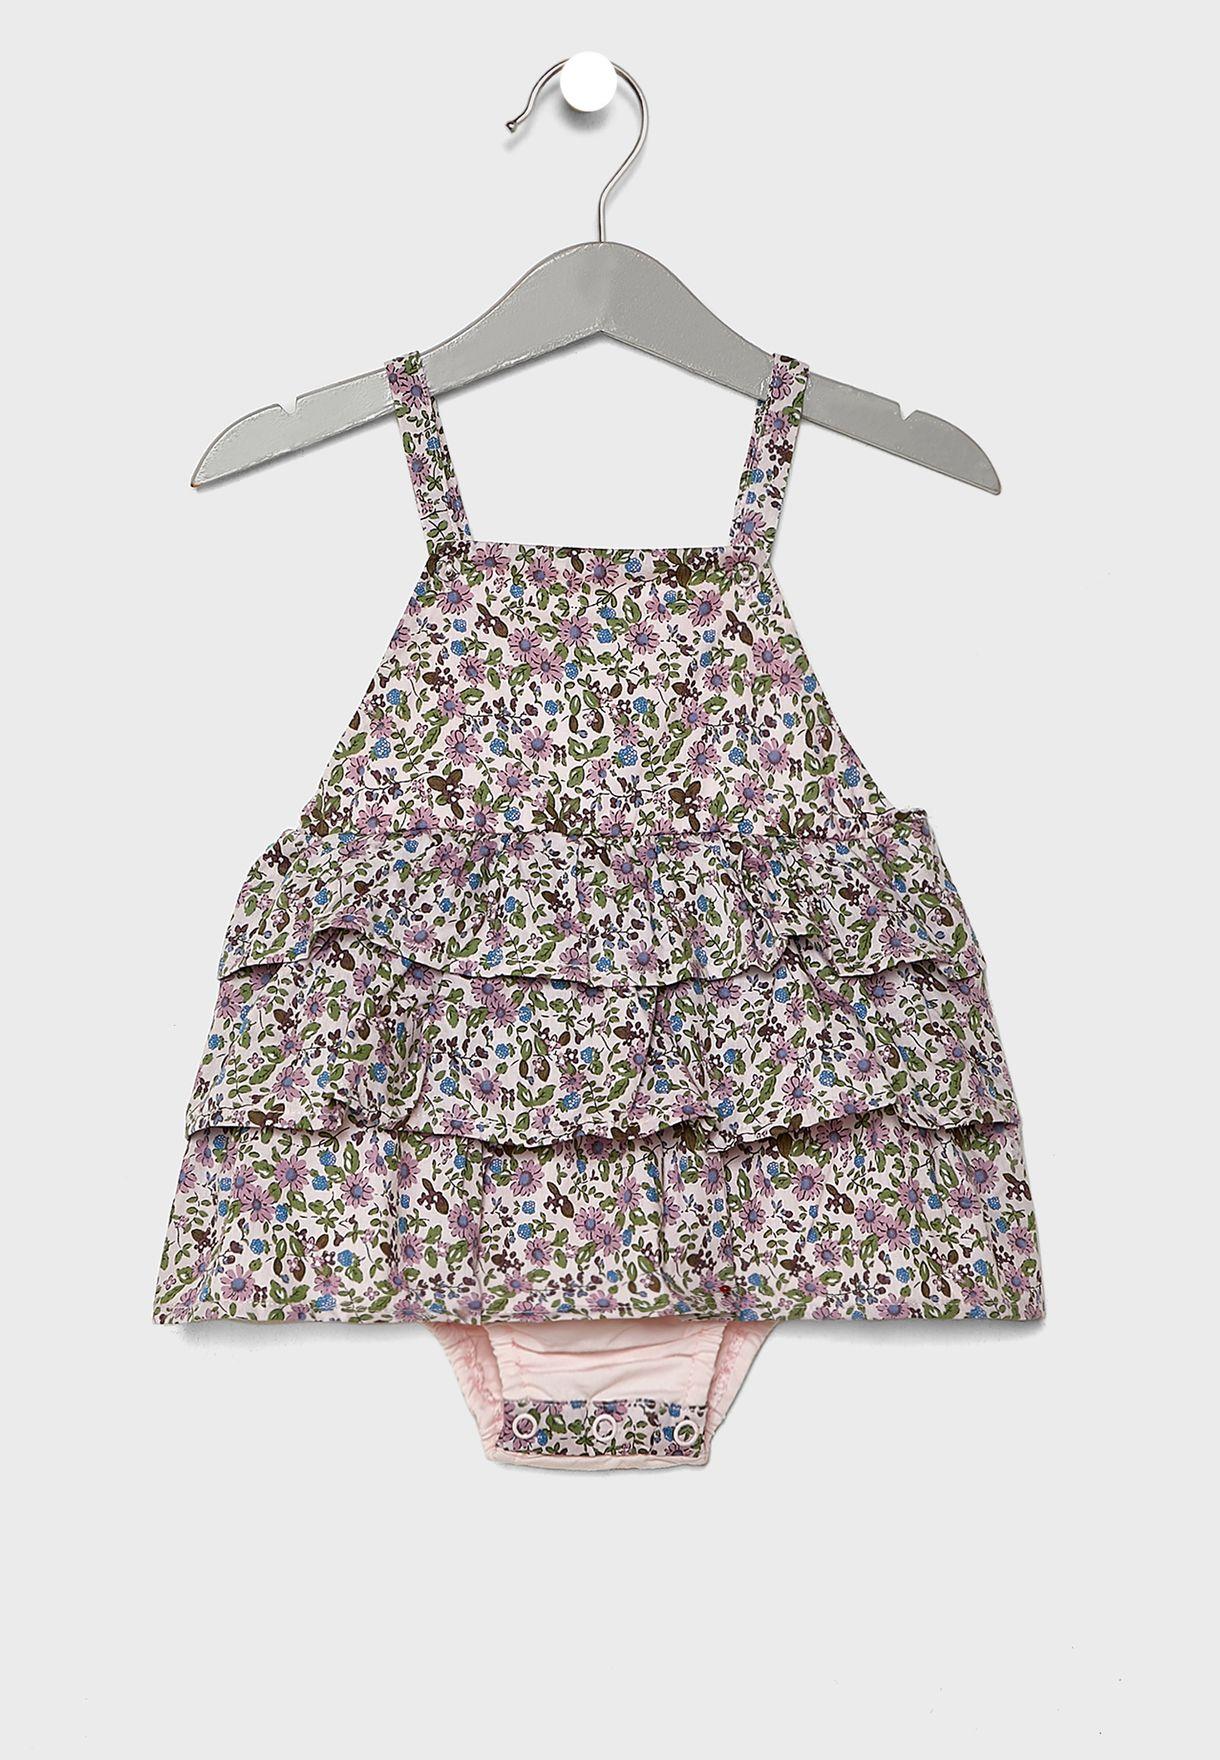 فستان بحمالات وطبقات كشكش